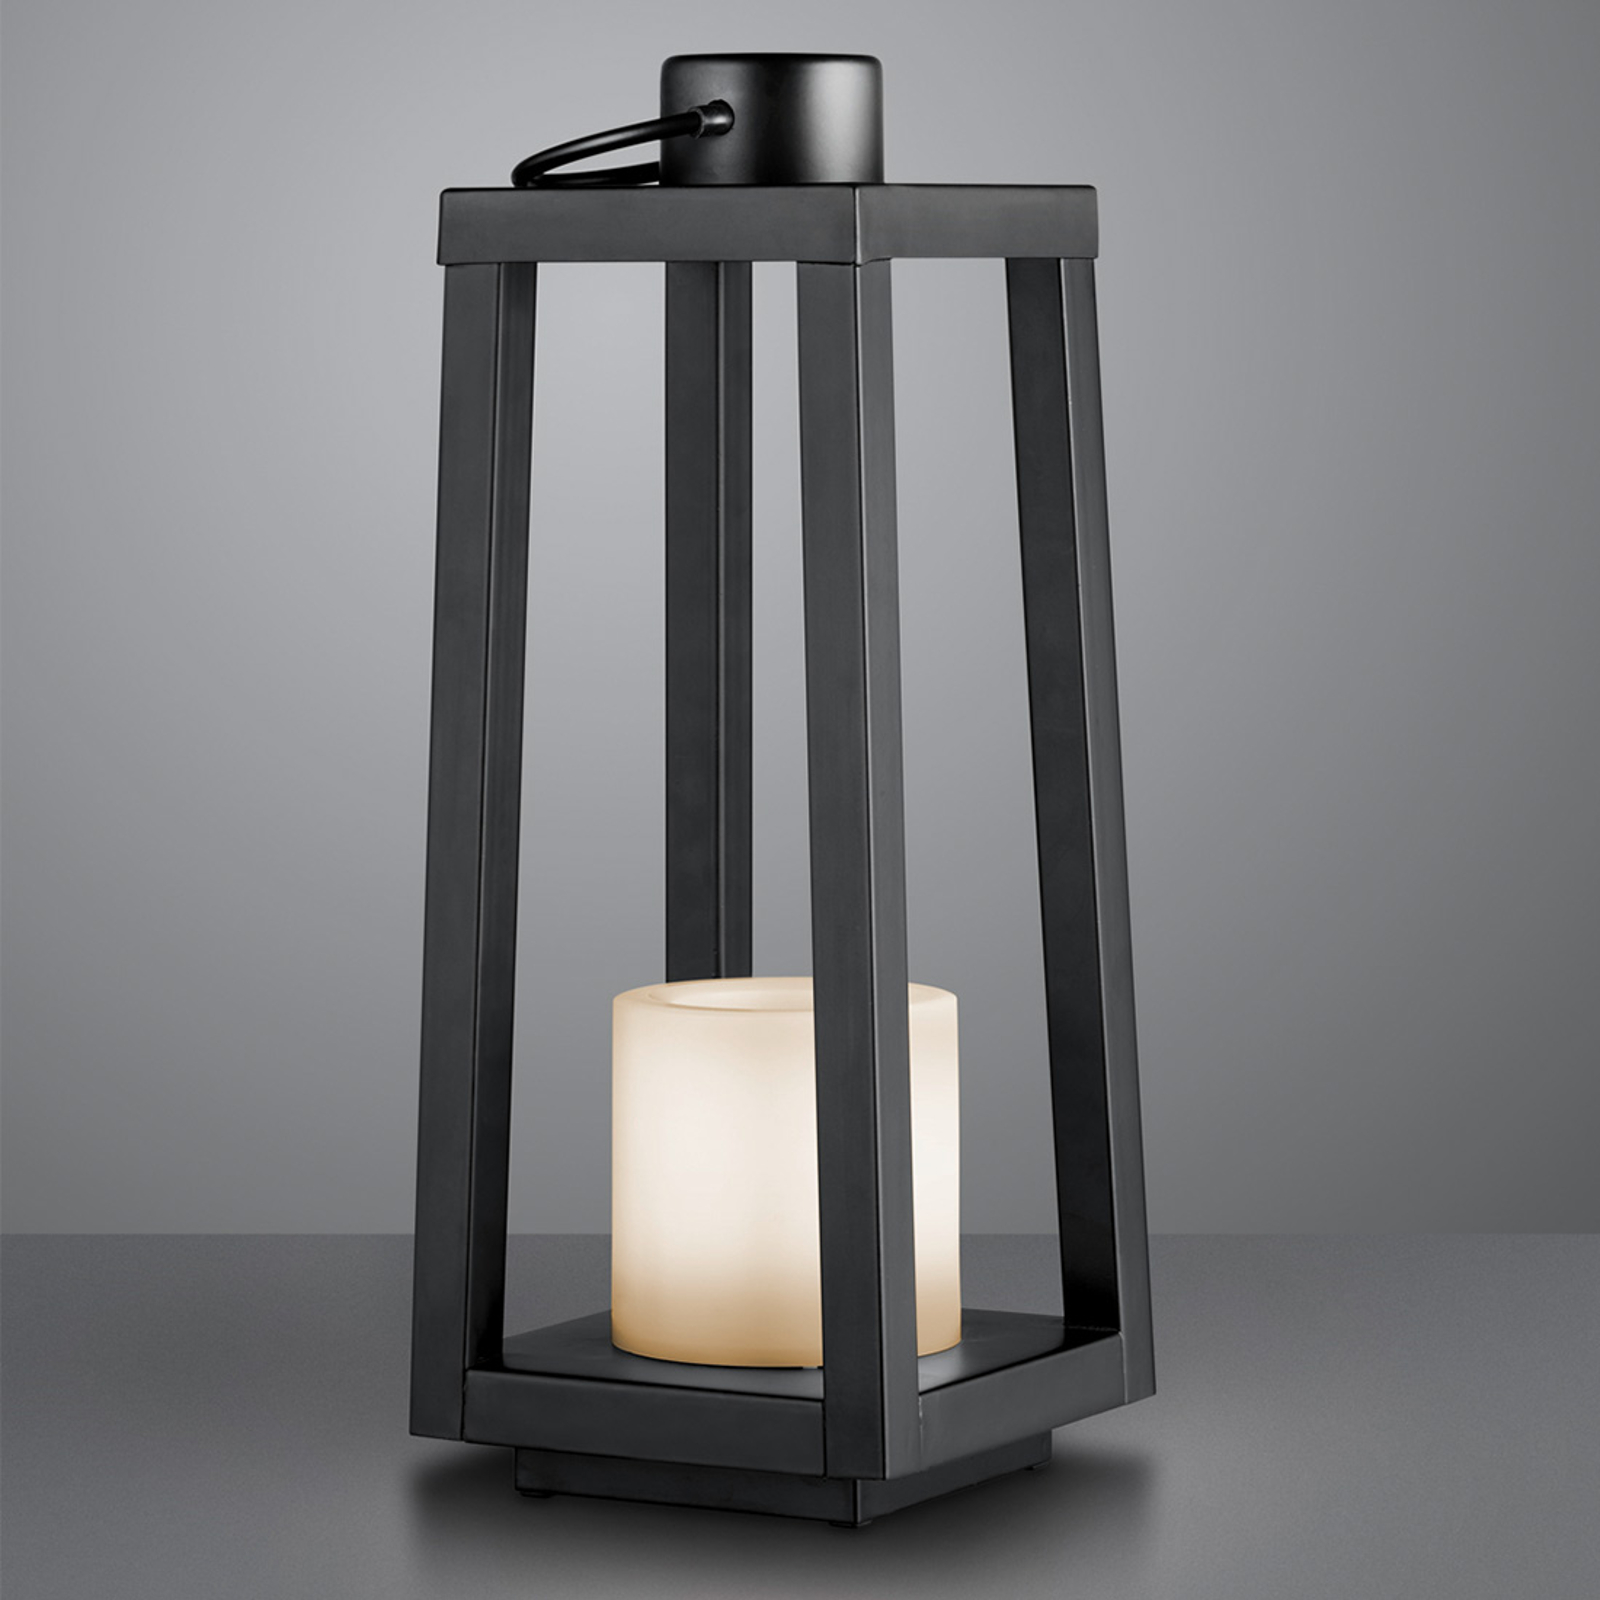 Soldreven LED-gulvlampe Loja, flammeeffekt